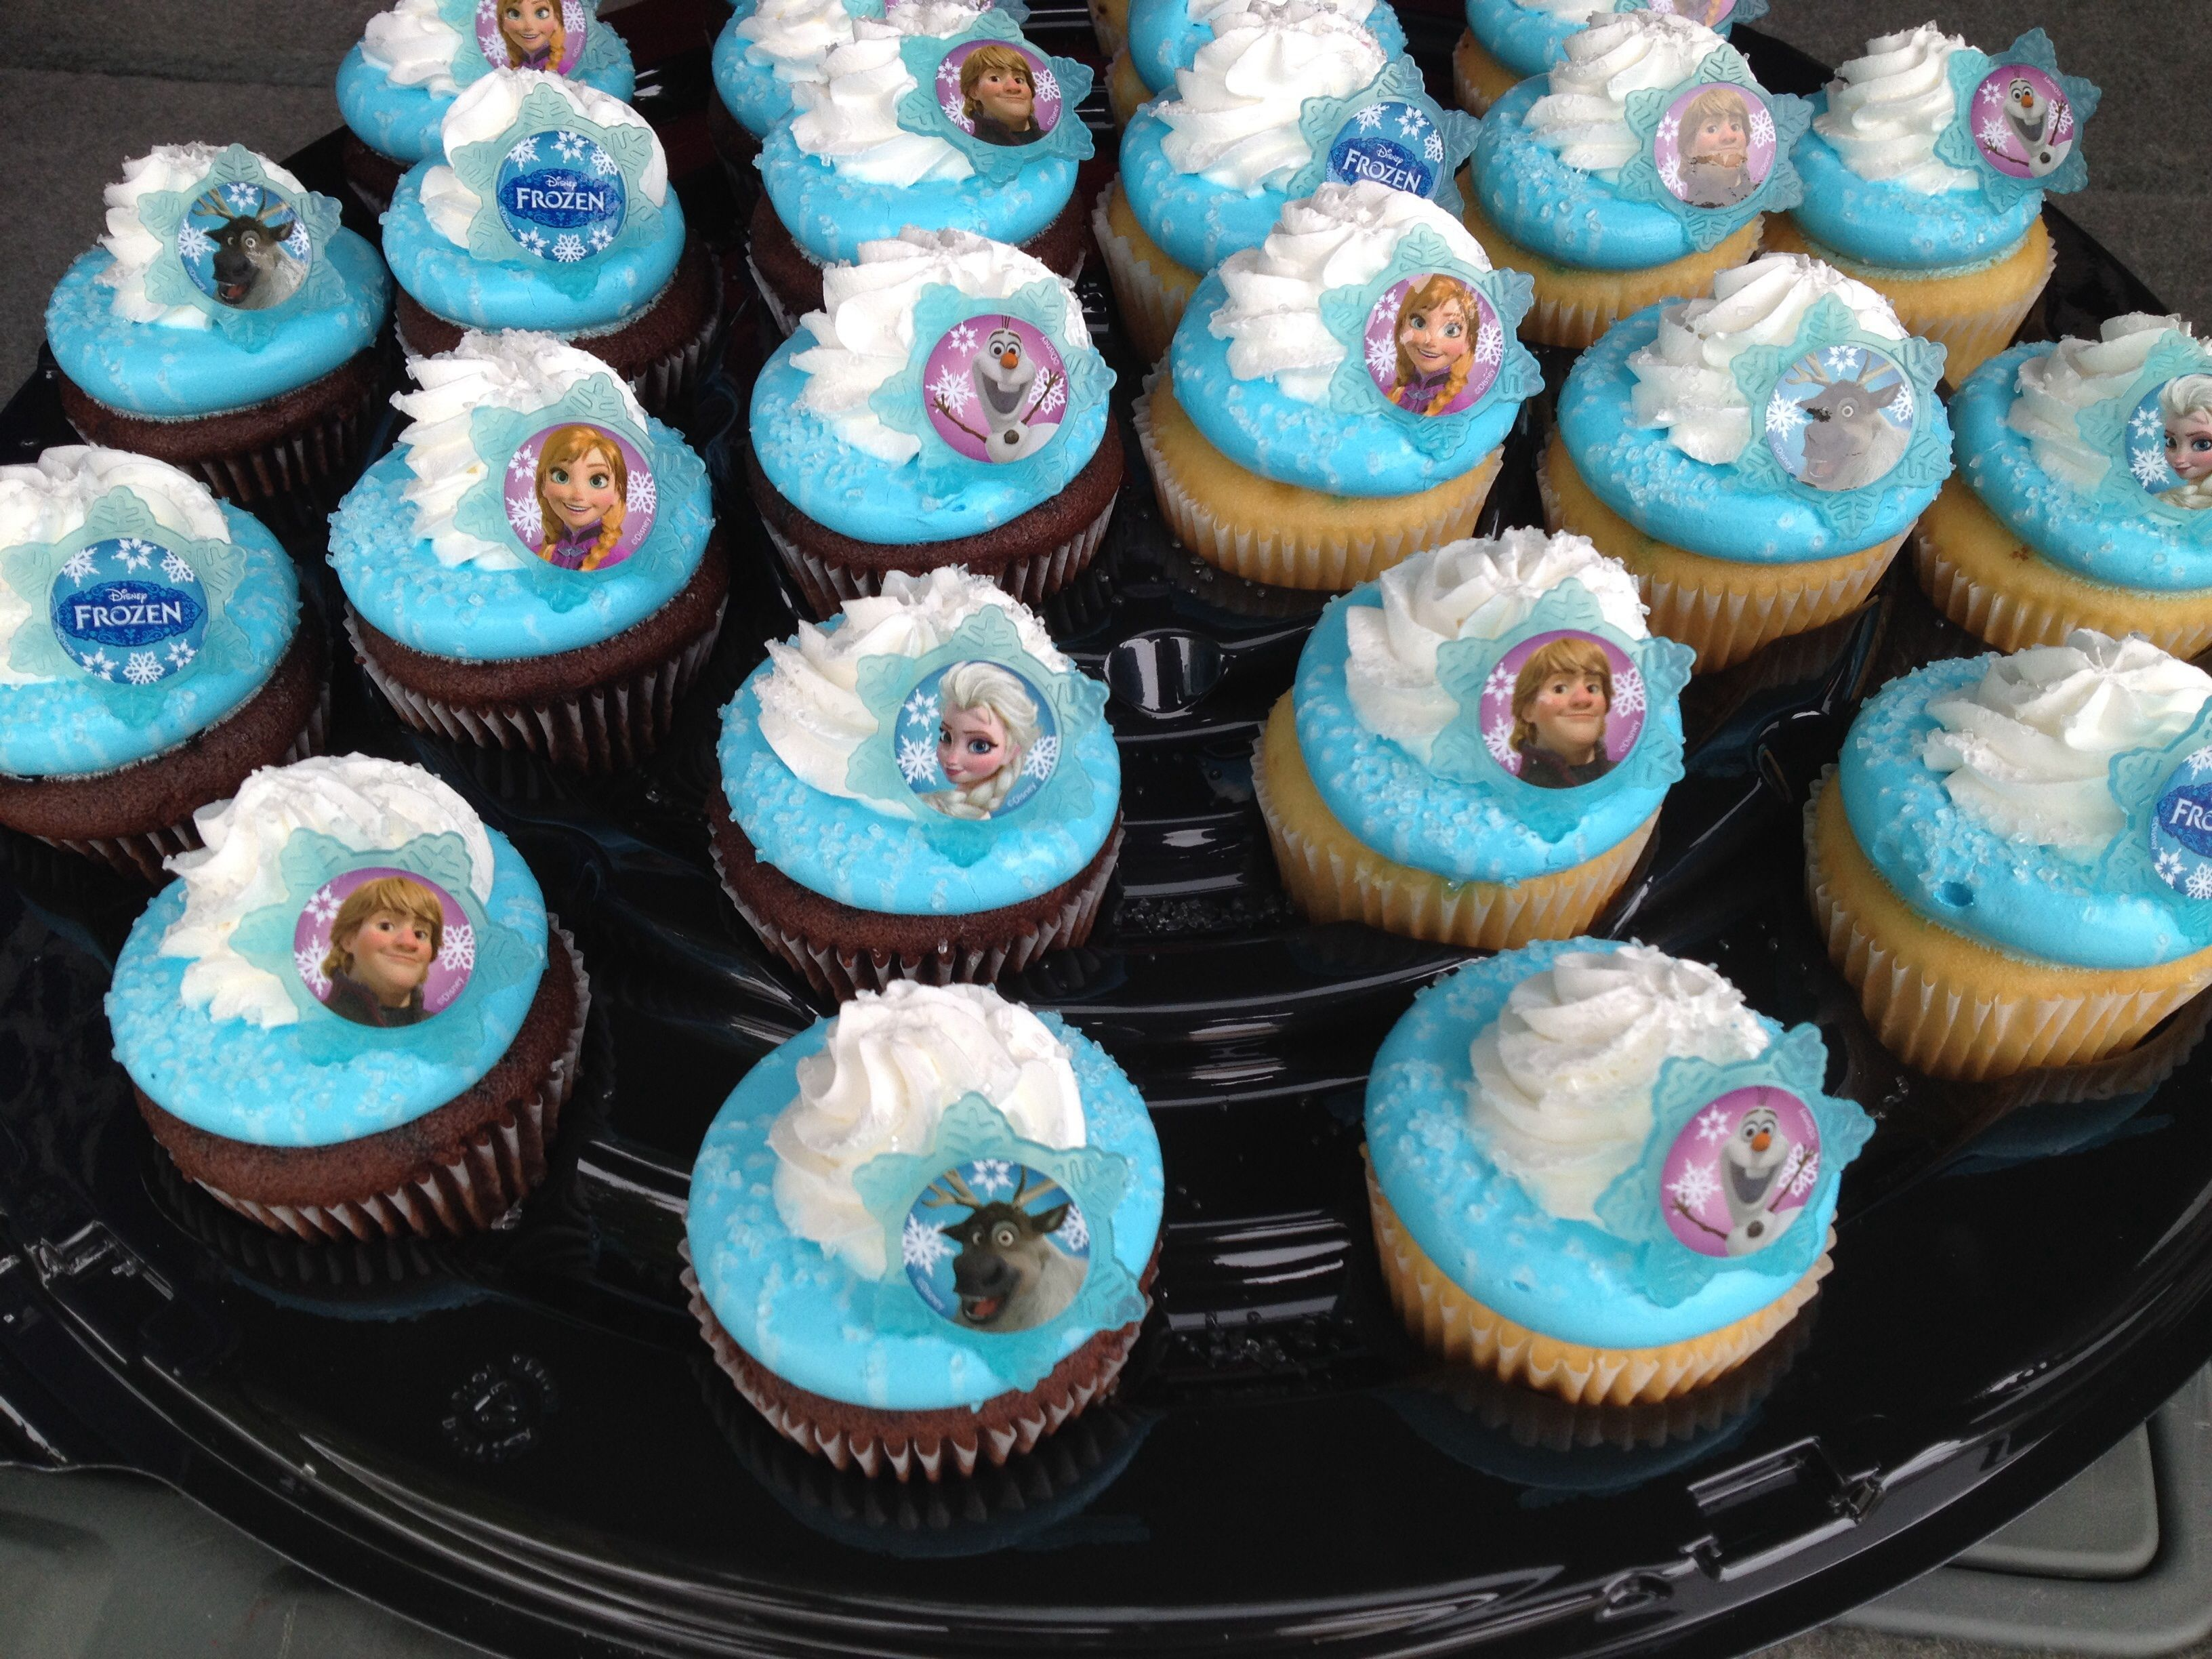 Disney Frozen Cupcakes From Walmart